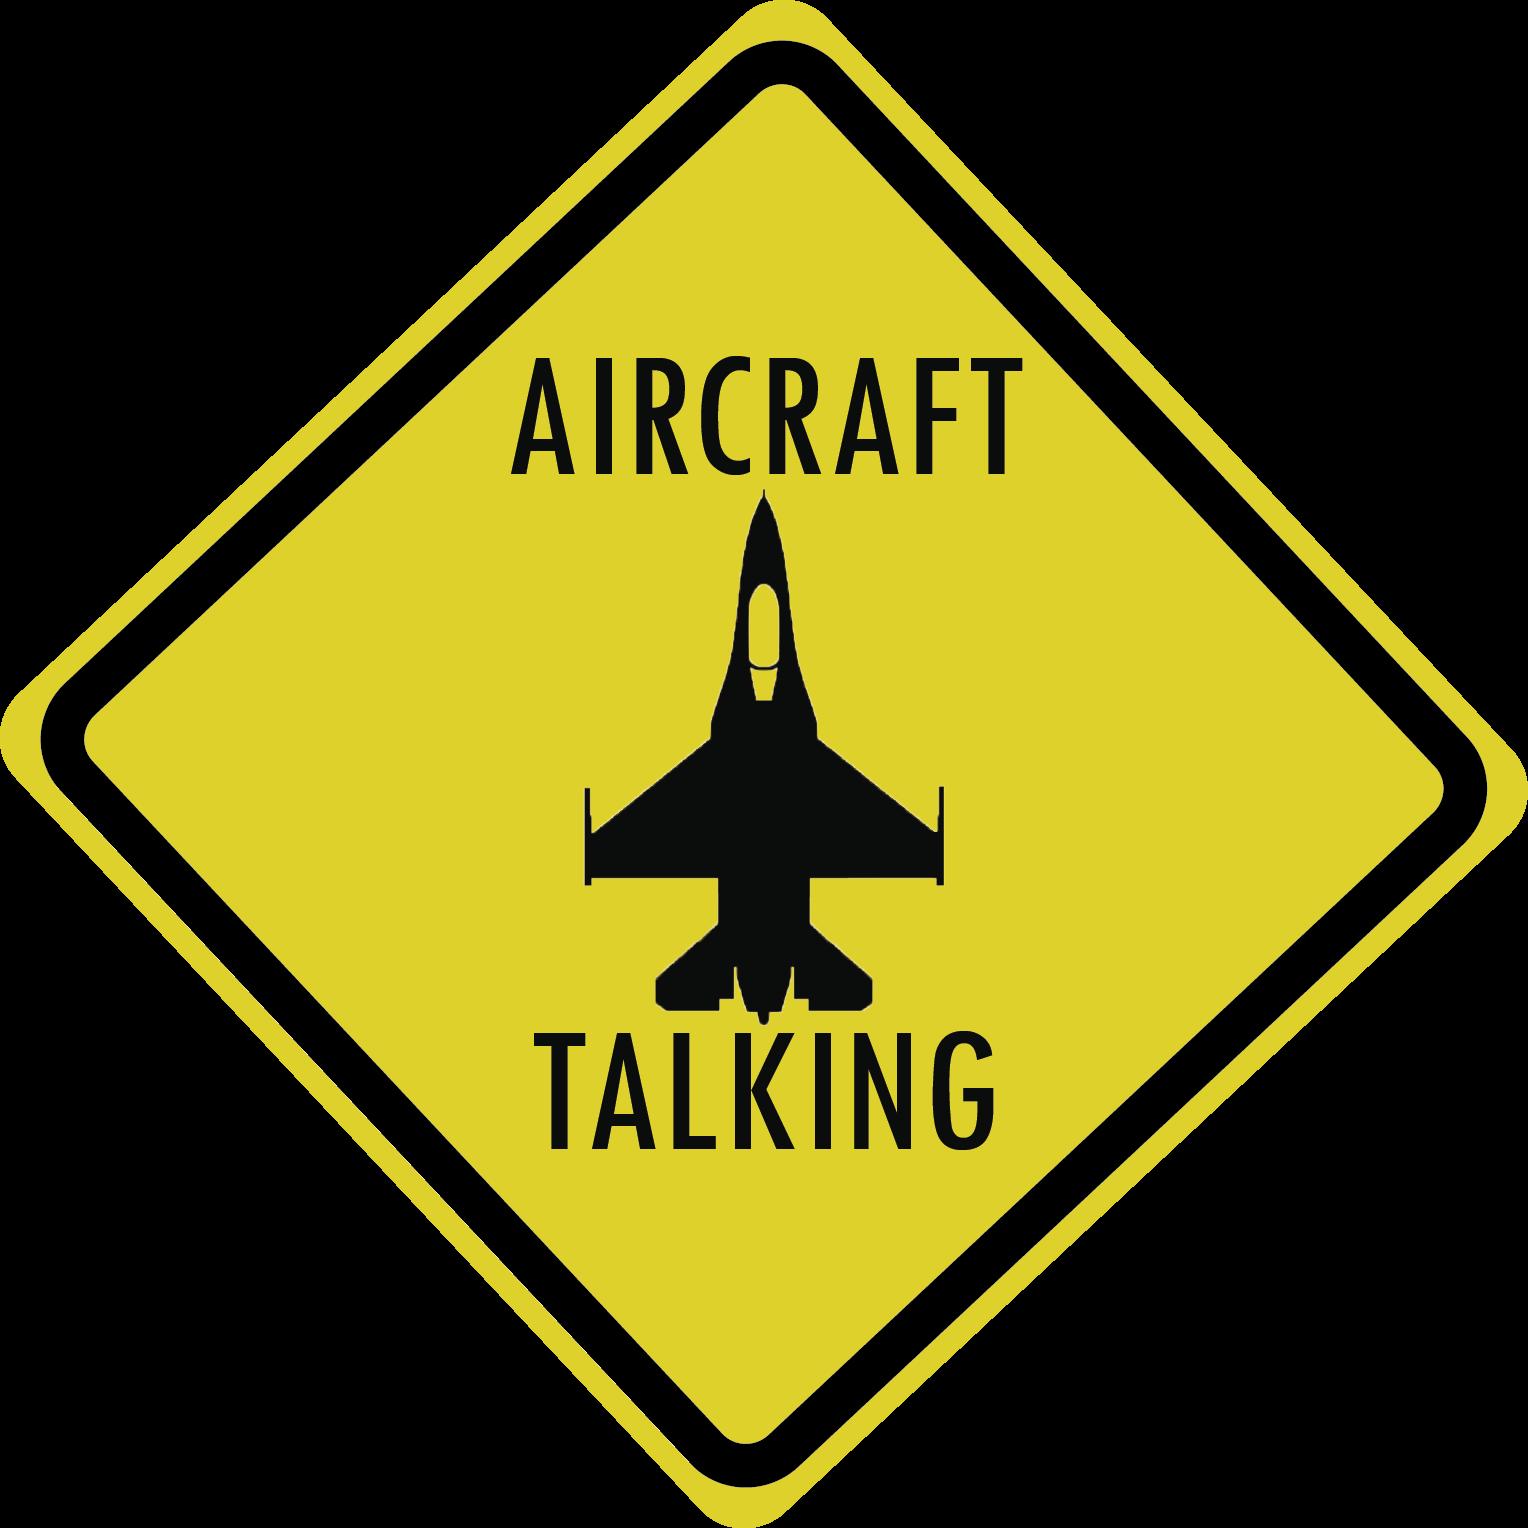 @AircraftTalking